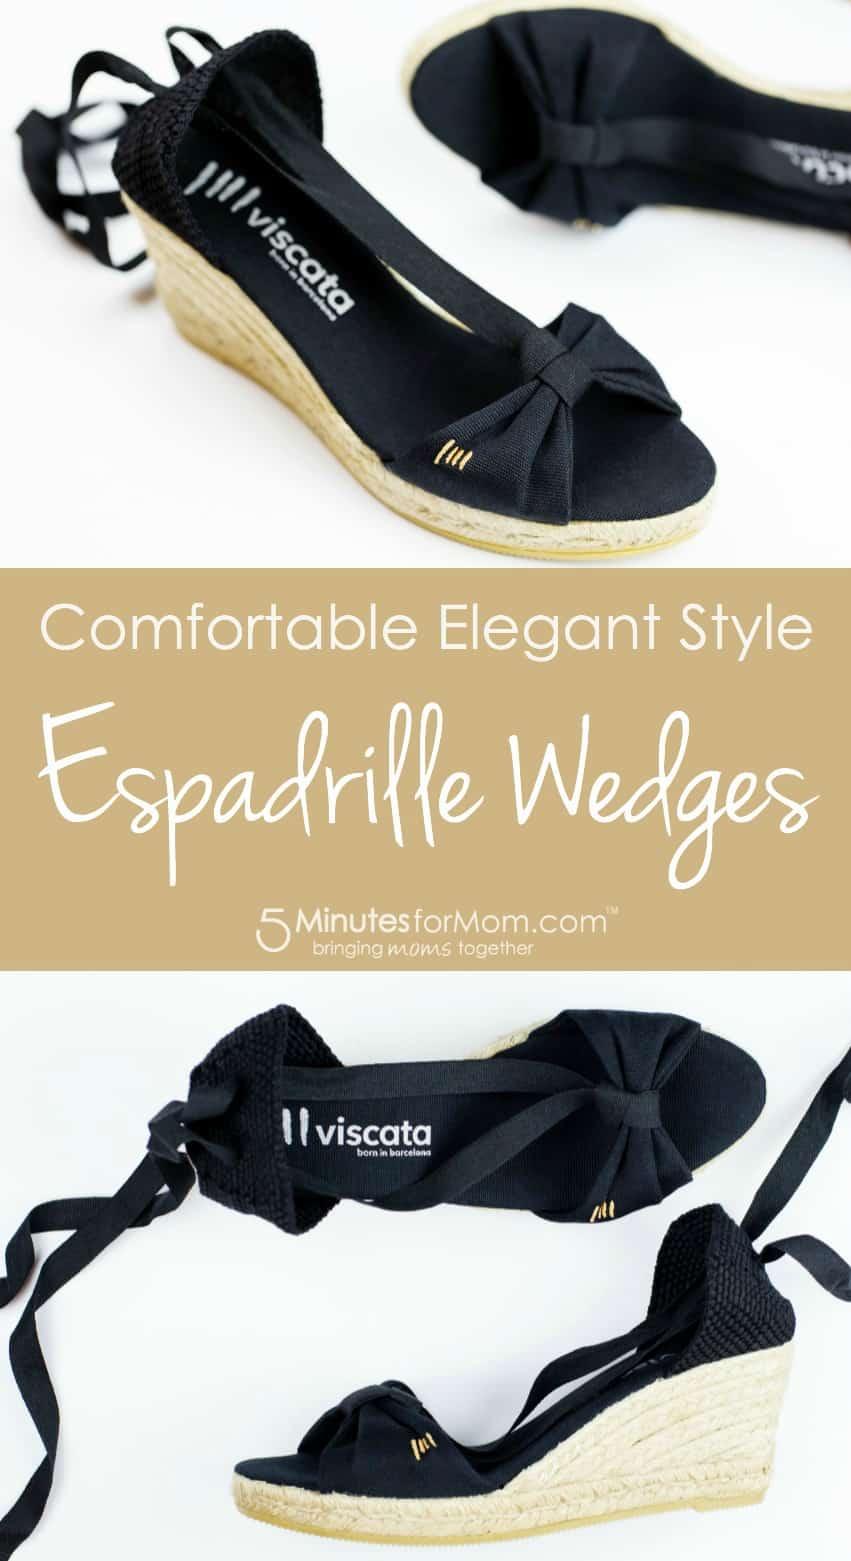 Espadrille Wedges - Comfortable Elegant Style